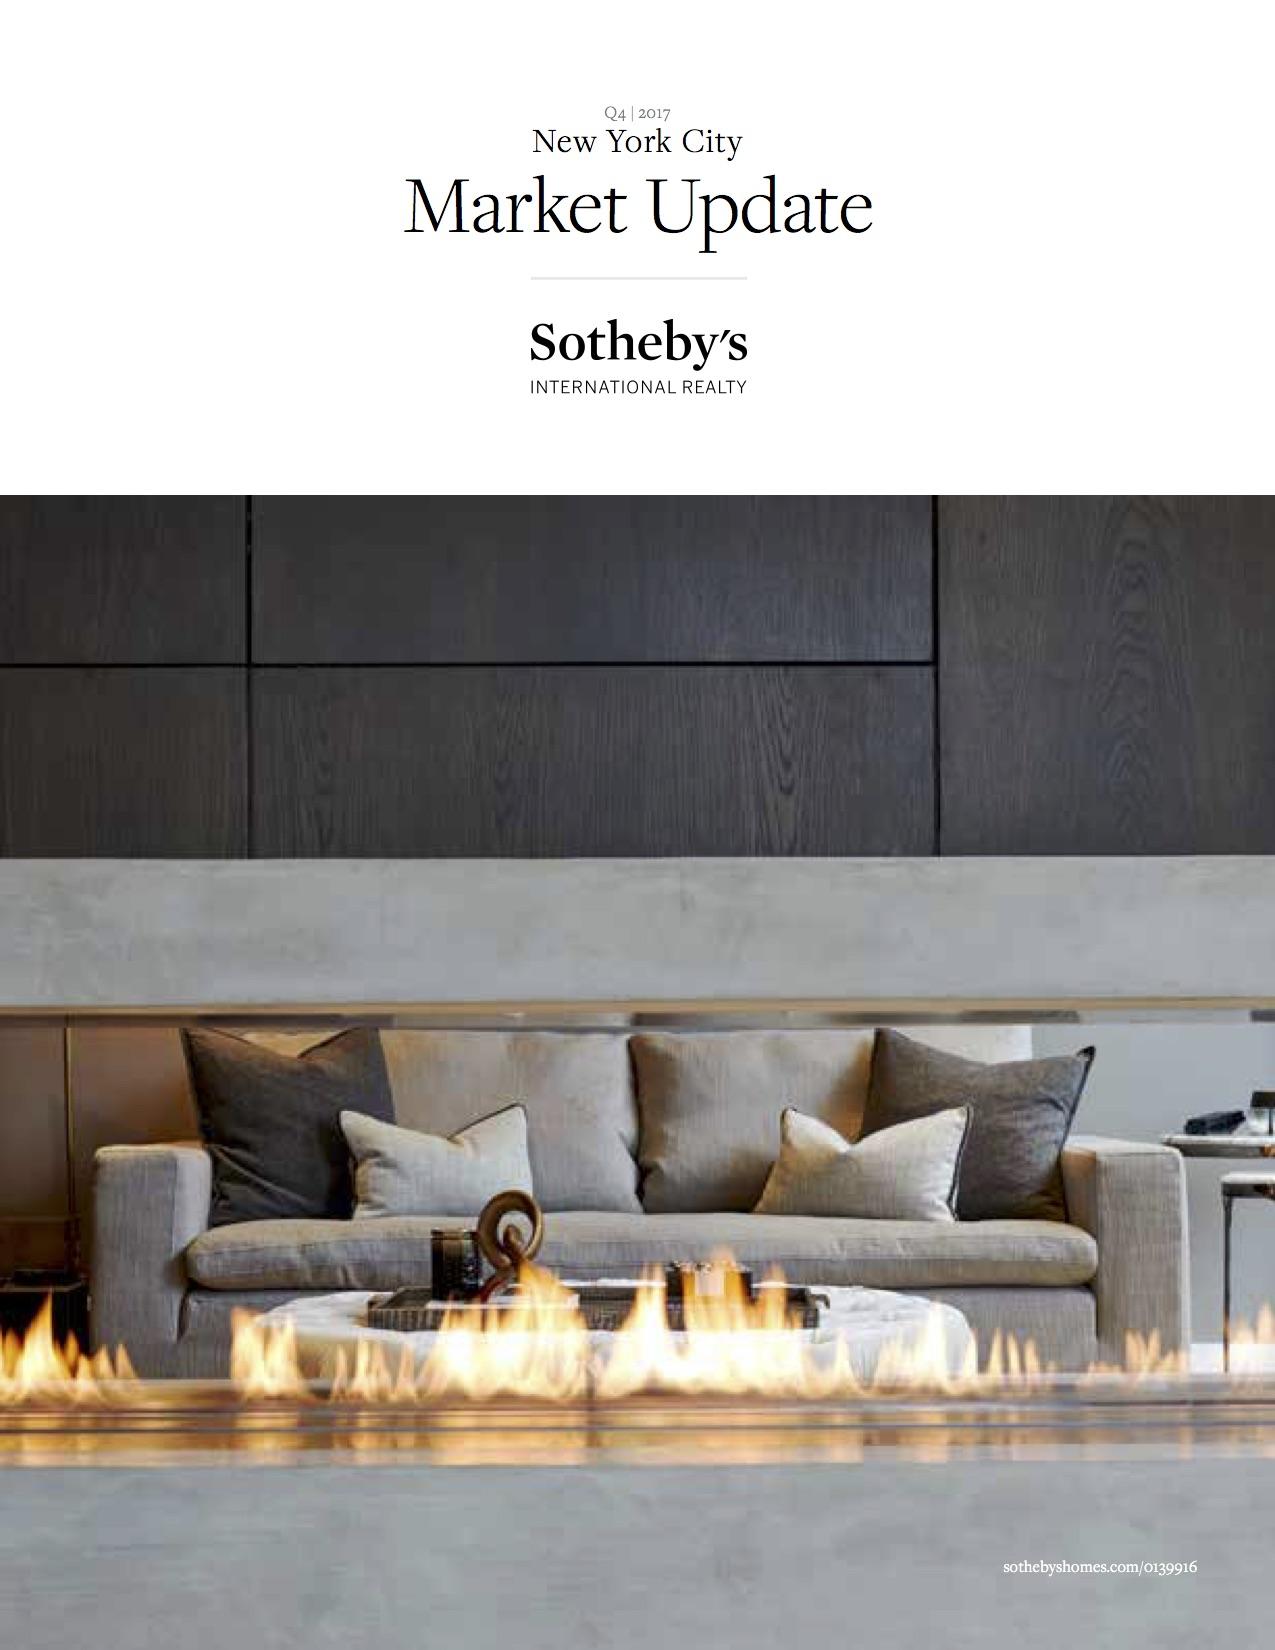 Sotheby's Internation Realty NYC MARKET REPORT_Q4_2017_1.jpg